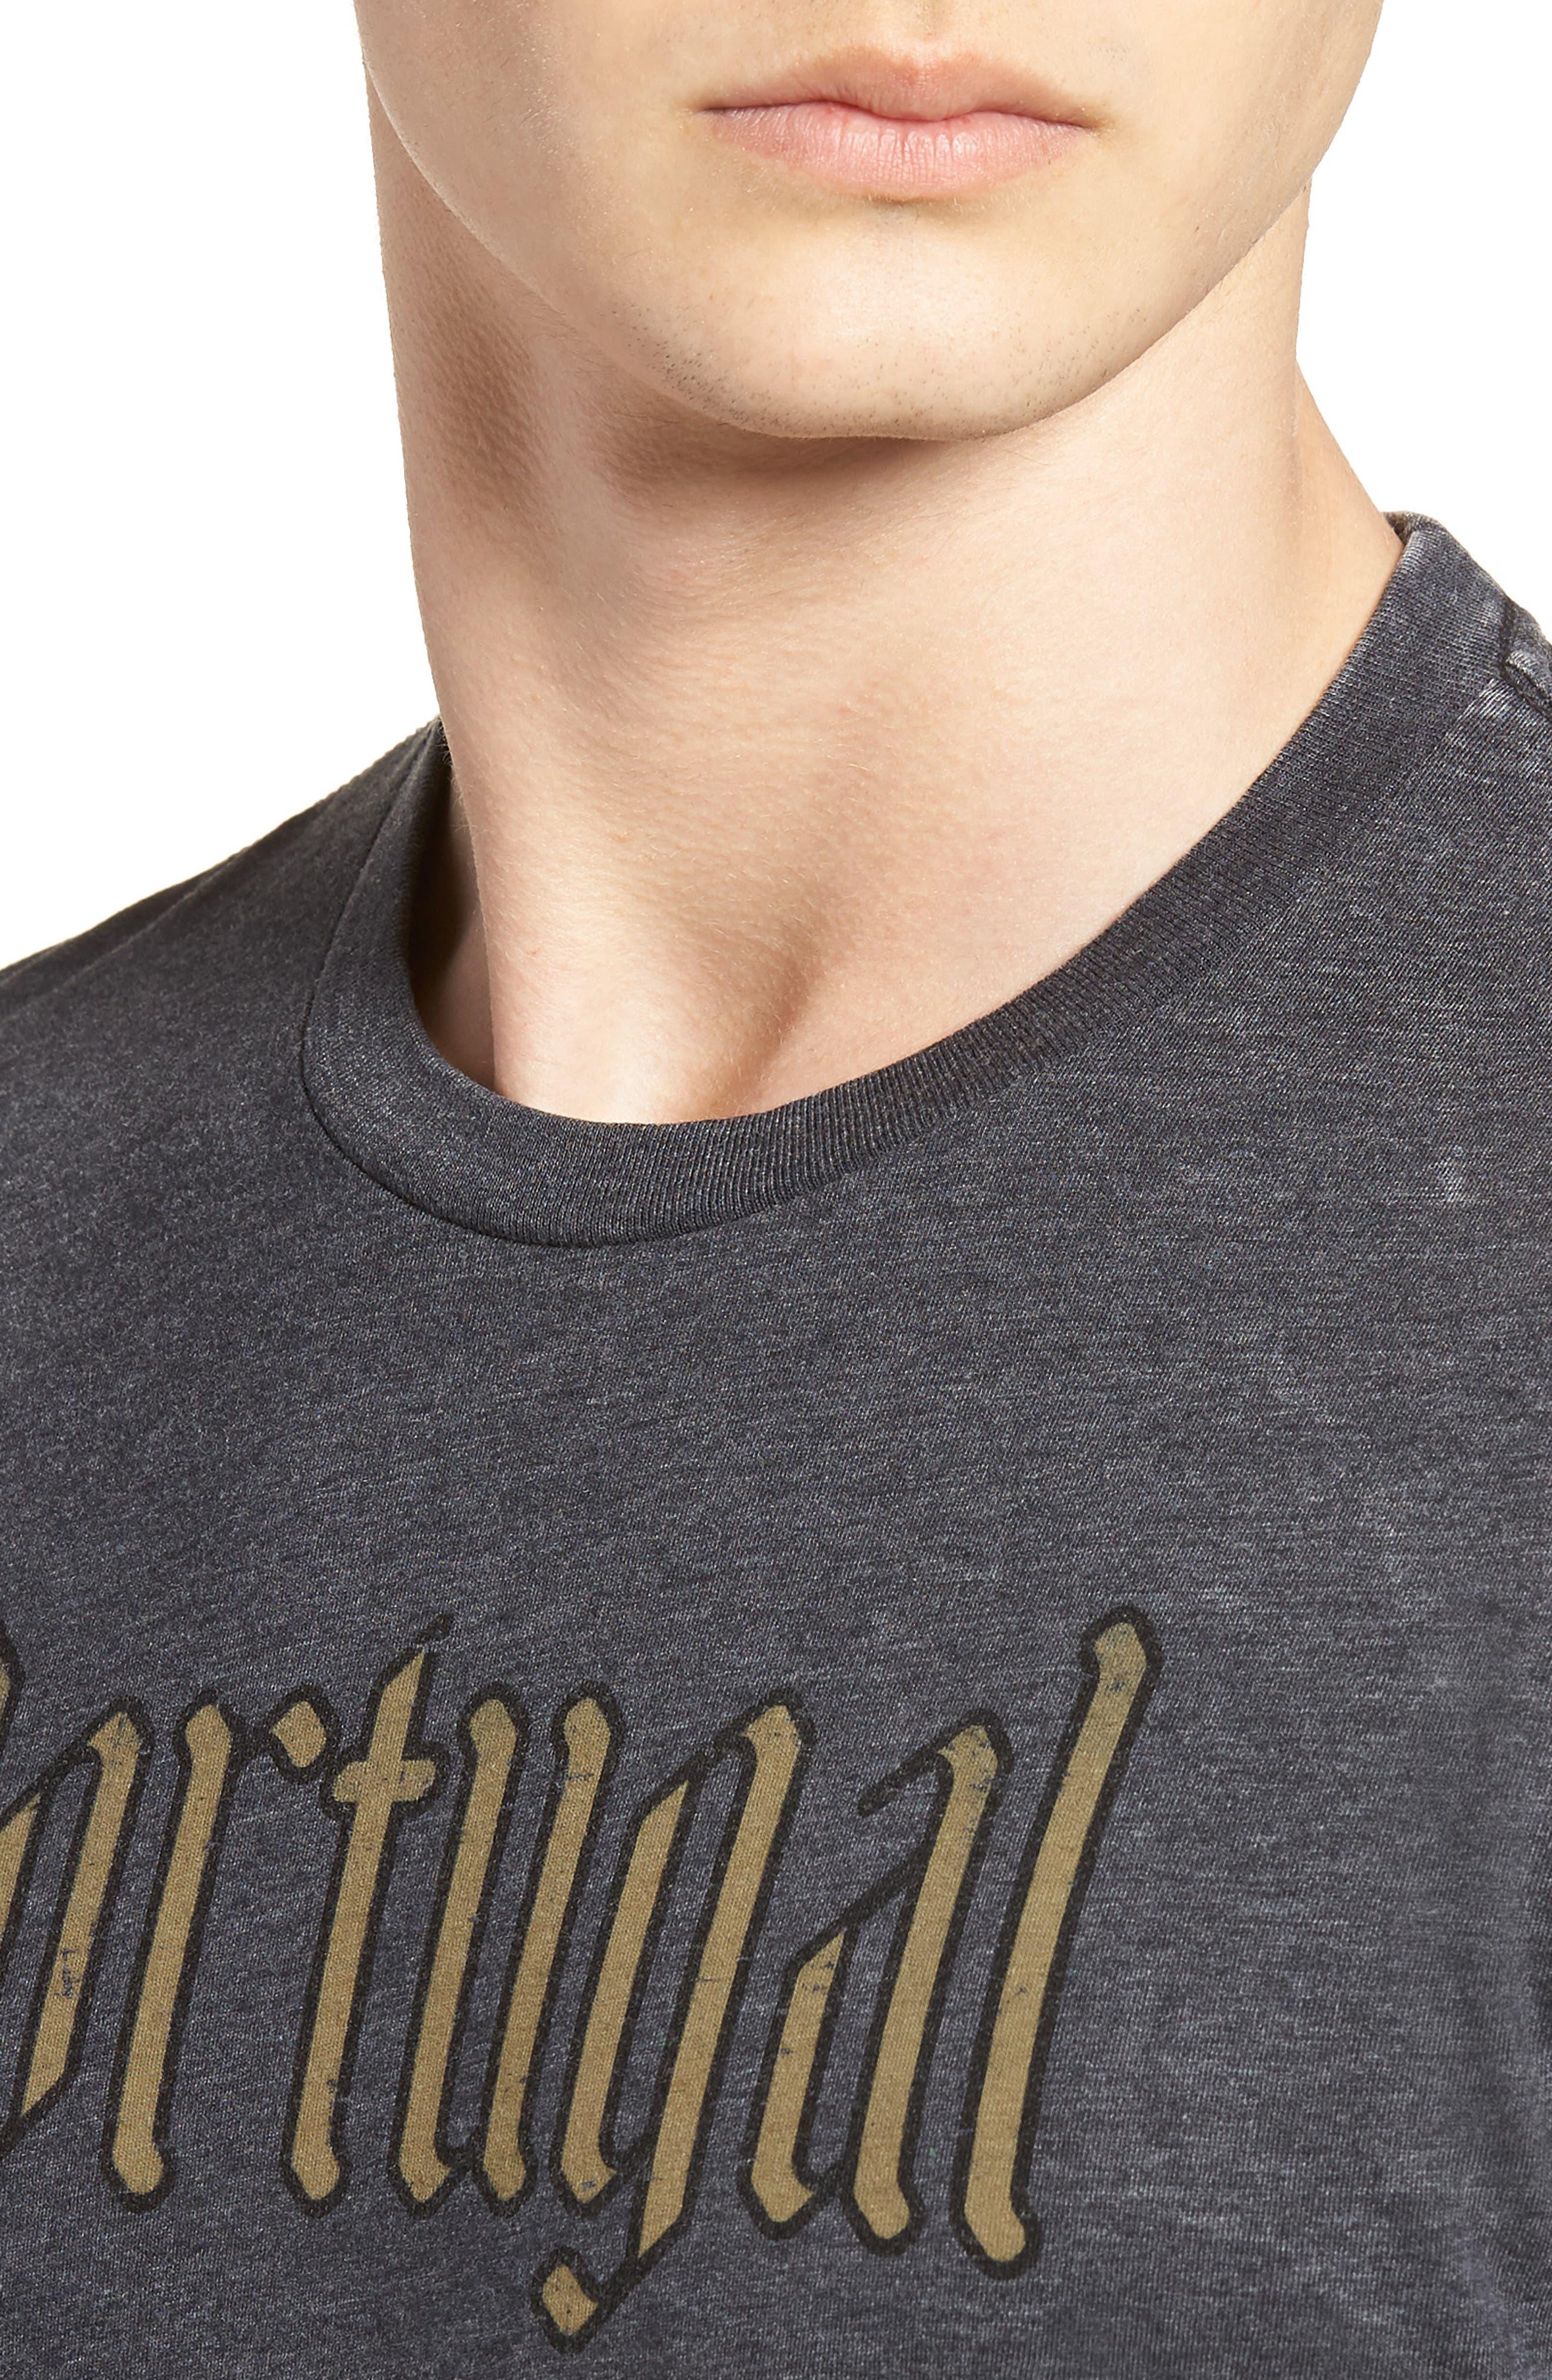 Portugal Jersey T-Shirt,                             Alternate thumbnail 4, color,                             020